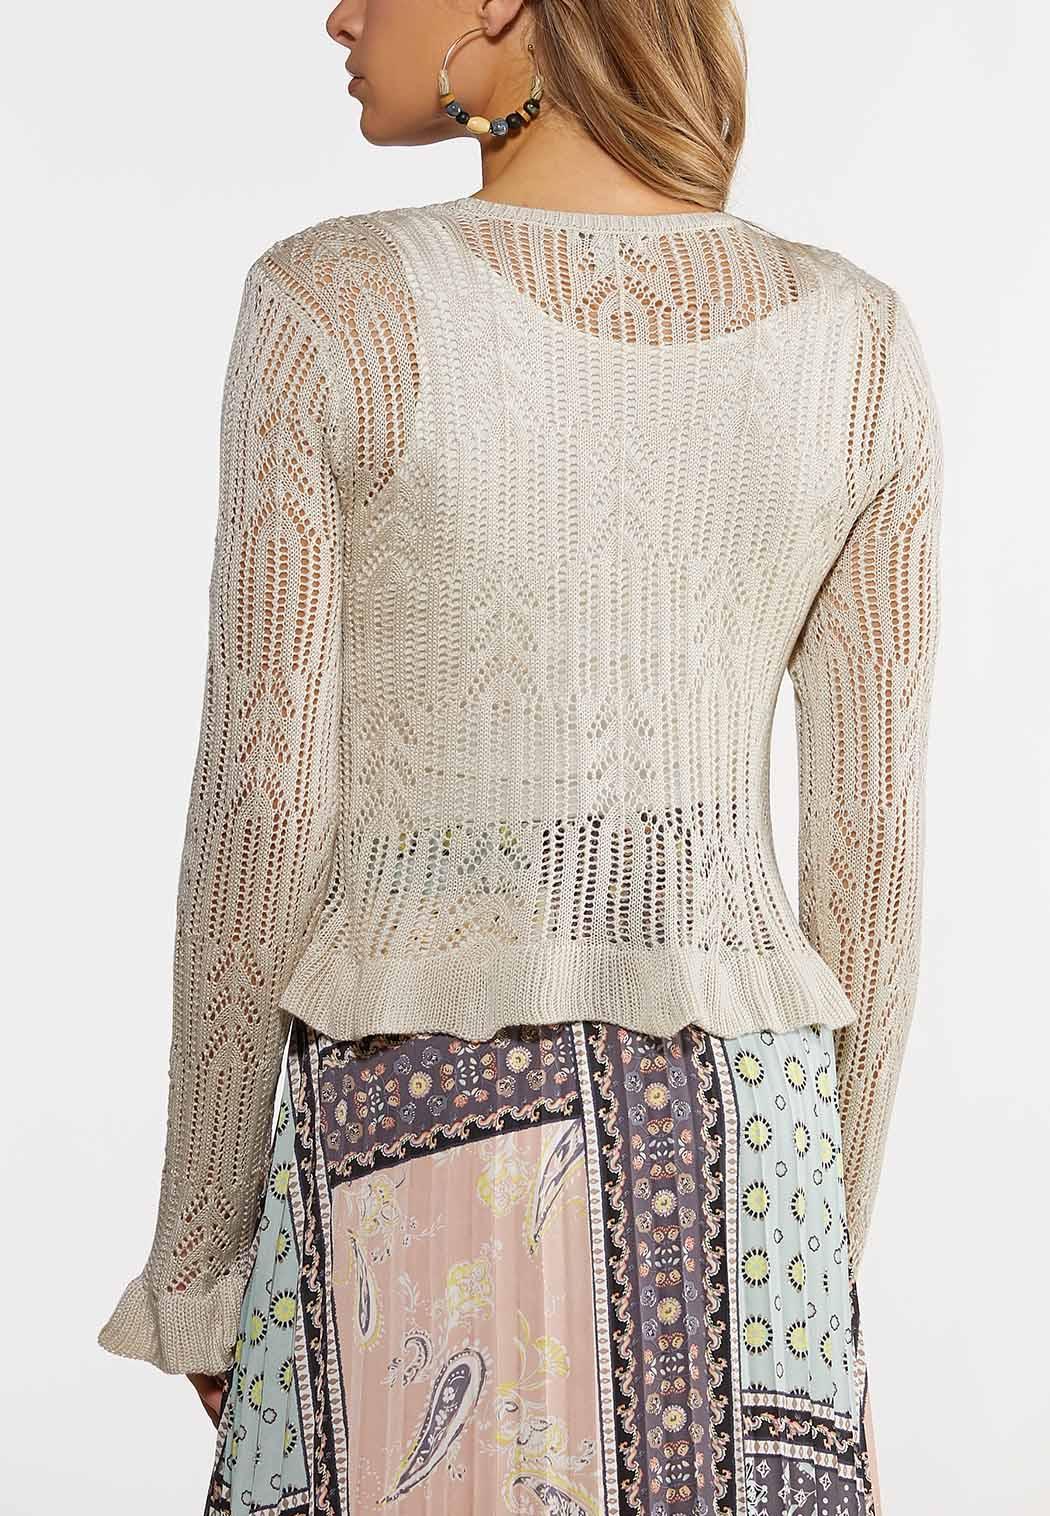 Pointelle Tie Front Cardigan Sweater (Item #44182408)